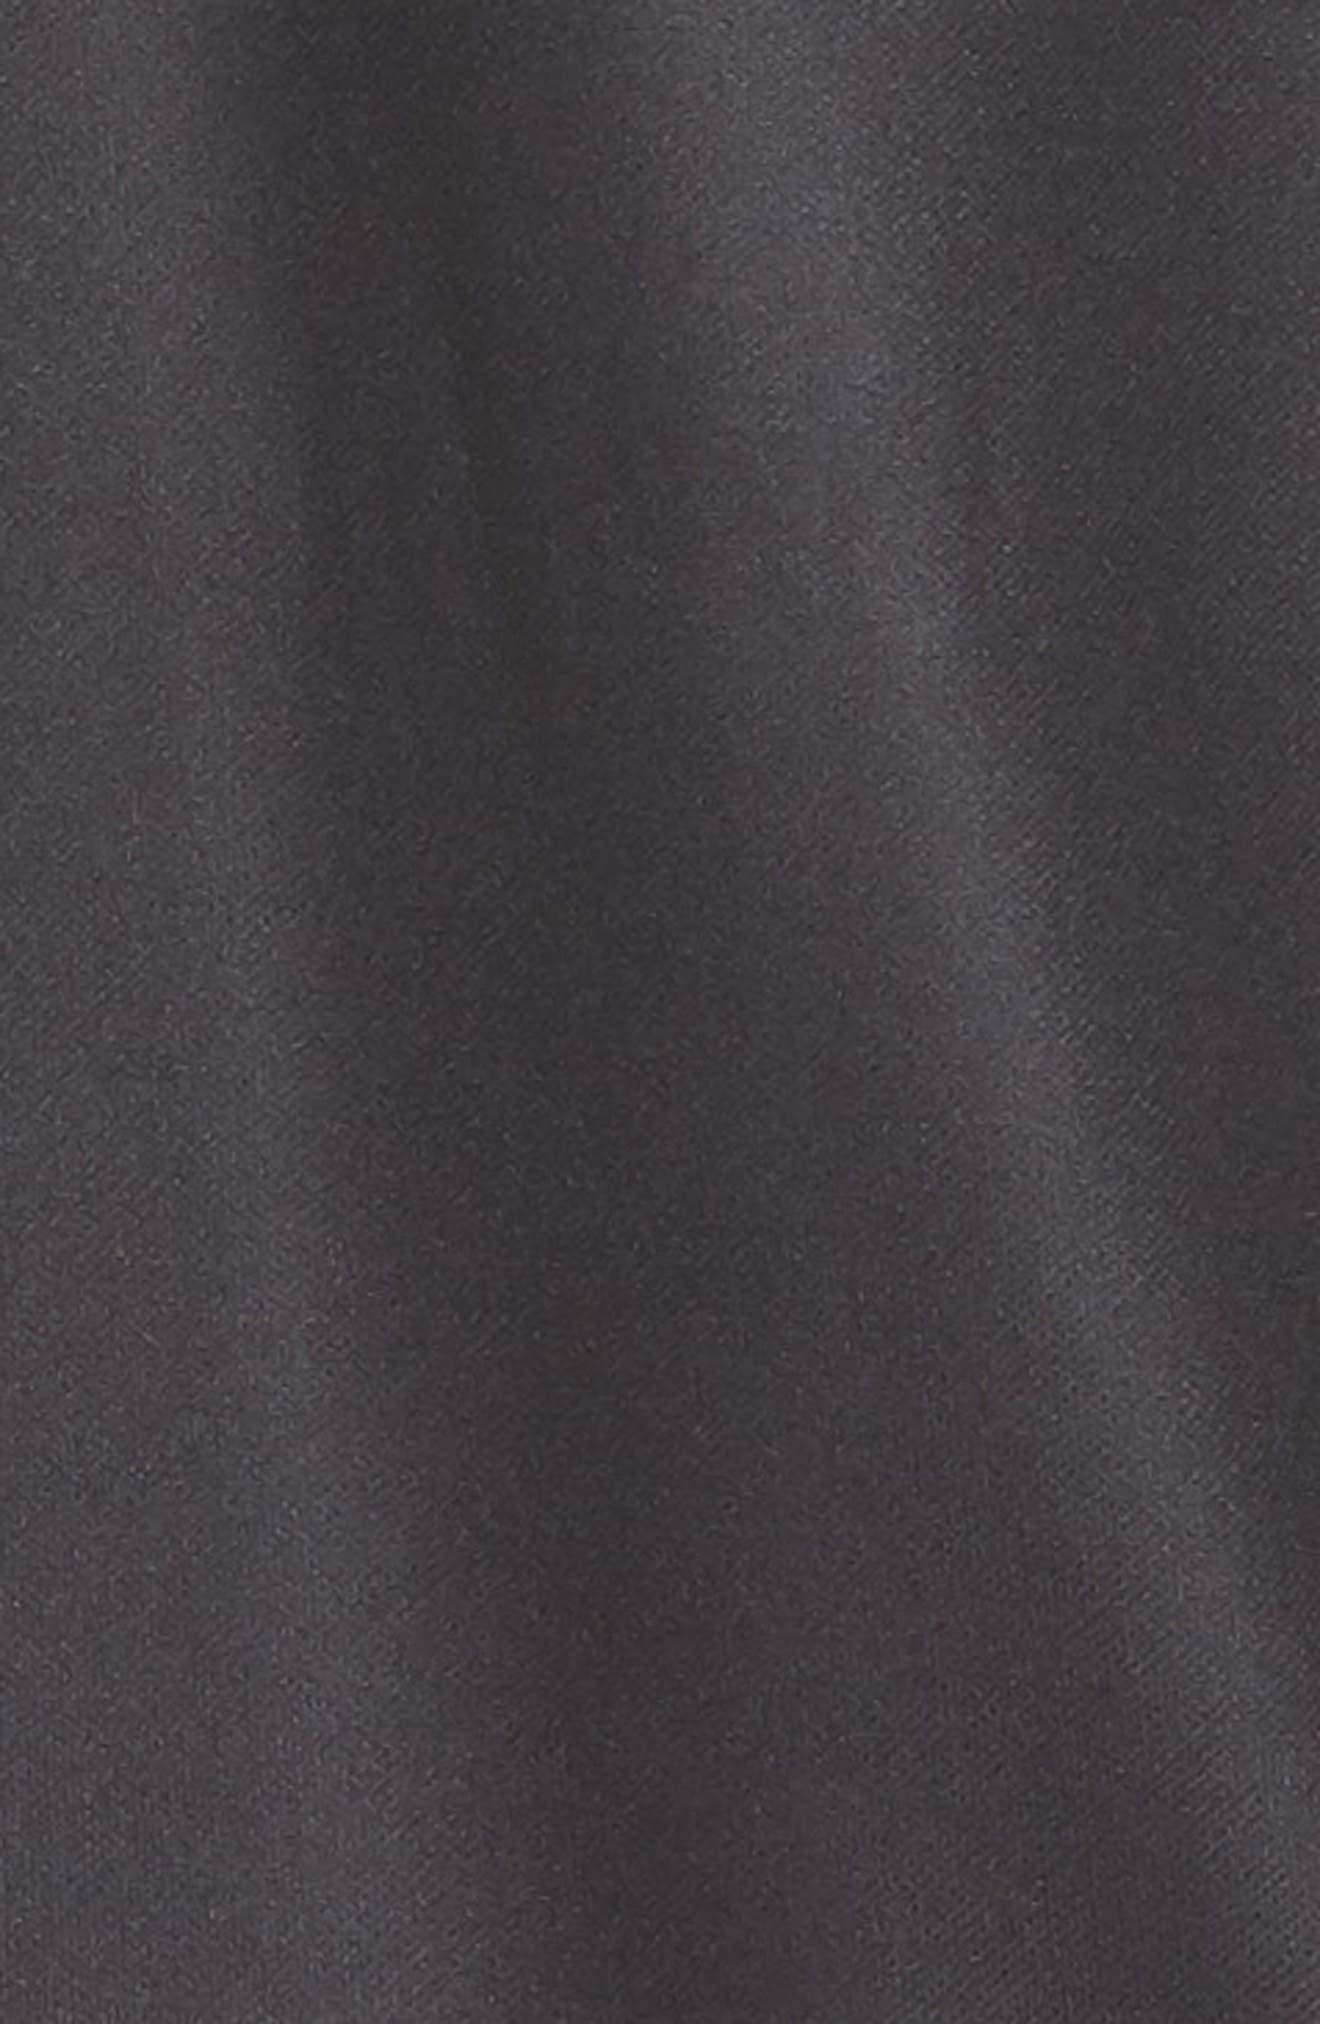 x Alexander Wang Track Jacket,                             Alternate thumbnail 6, color,